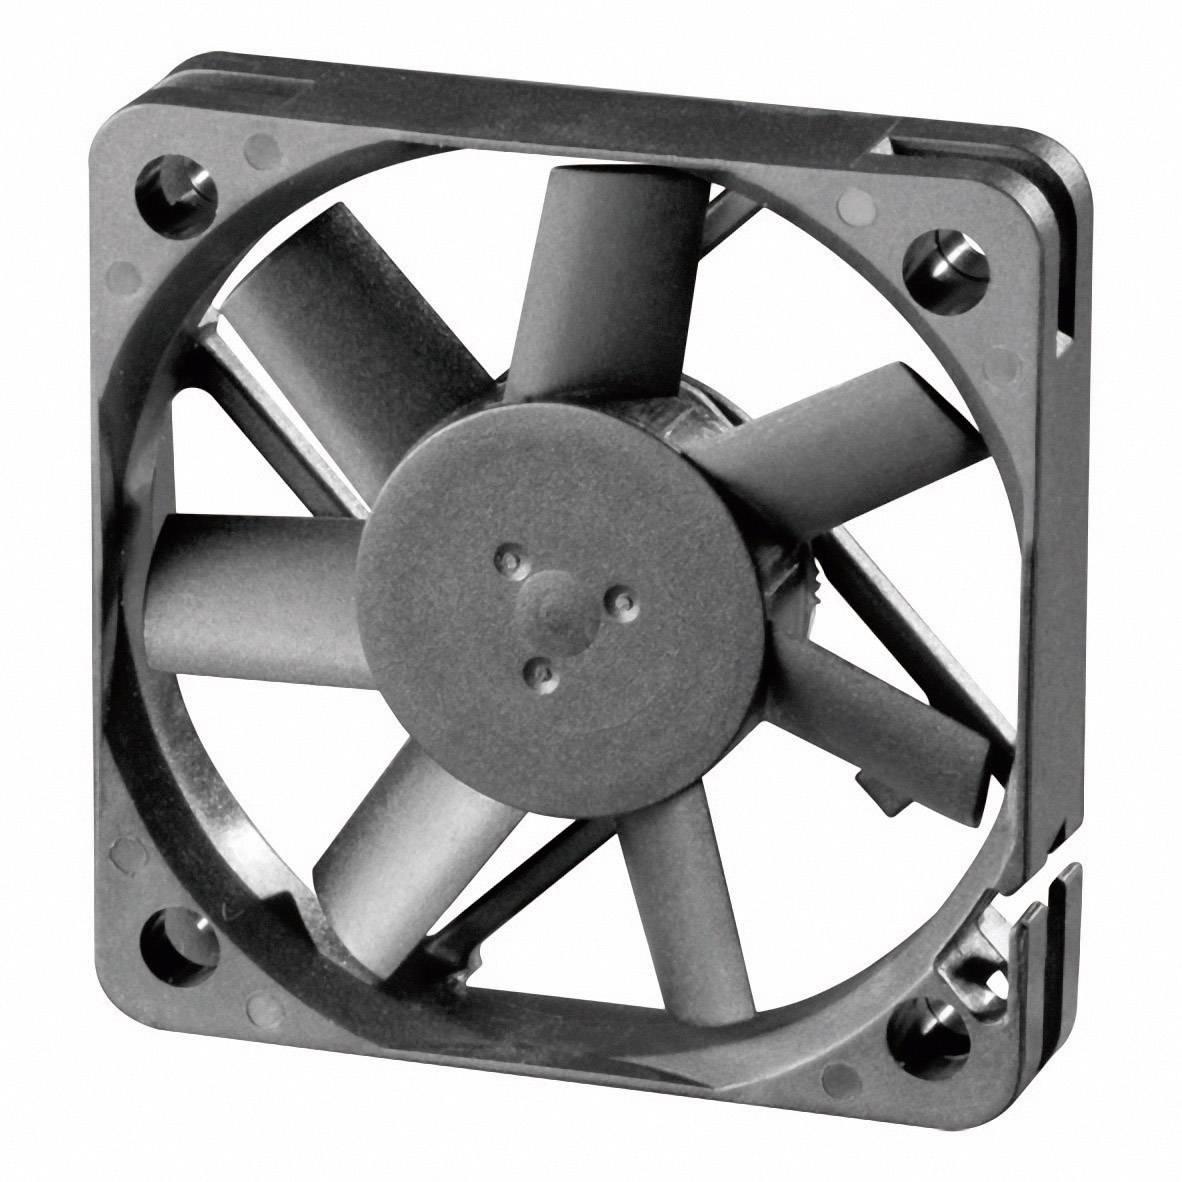 Ventilátor Sunon DR EE50100S1-000U-999, 50 x 50 x 10 mm, 5 V/DC